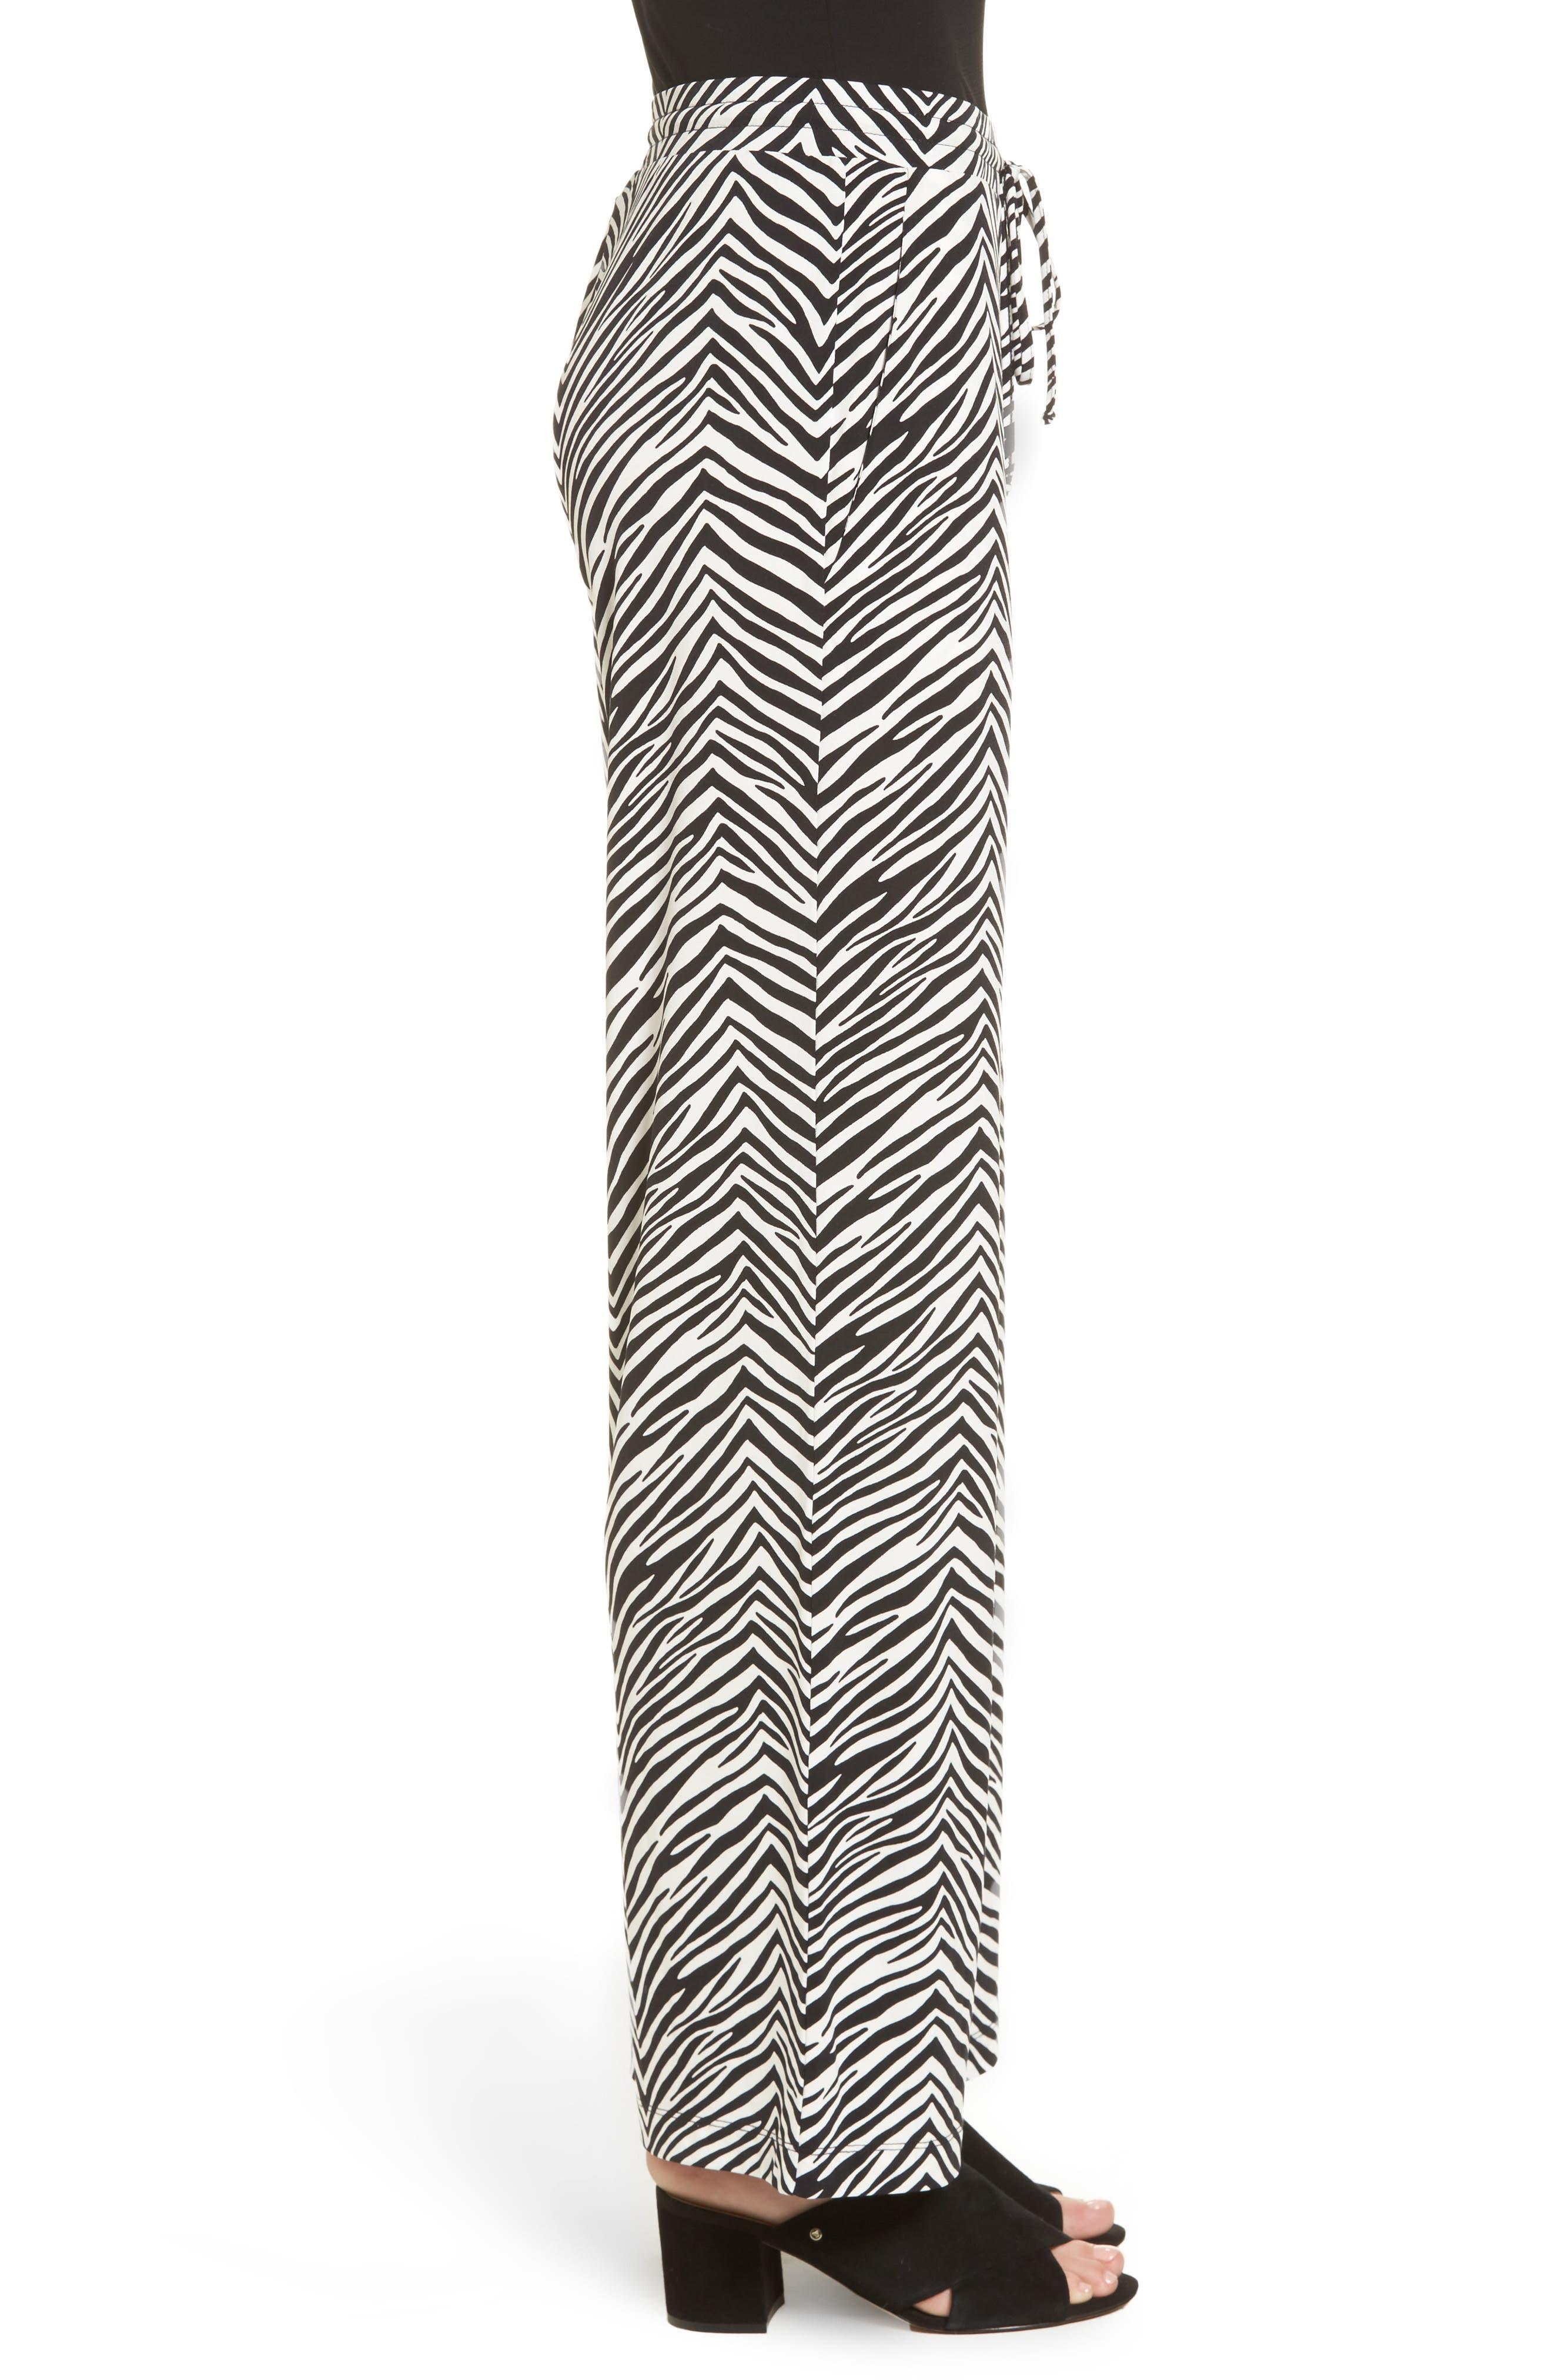 Zebra Print Drawstring Waist Pants,                             Alternate thumbnail 3, color,                             010